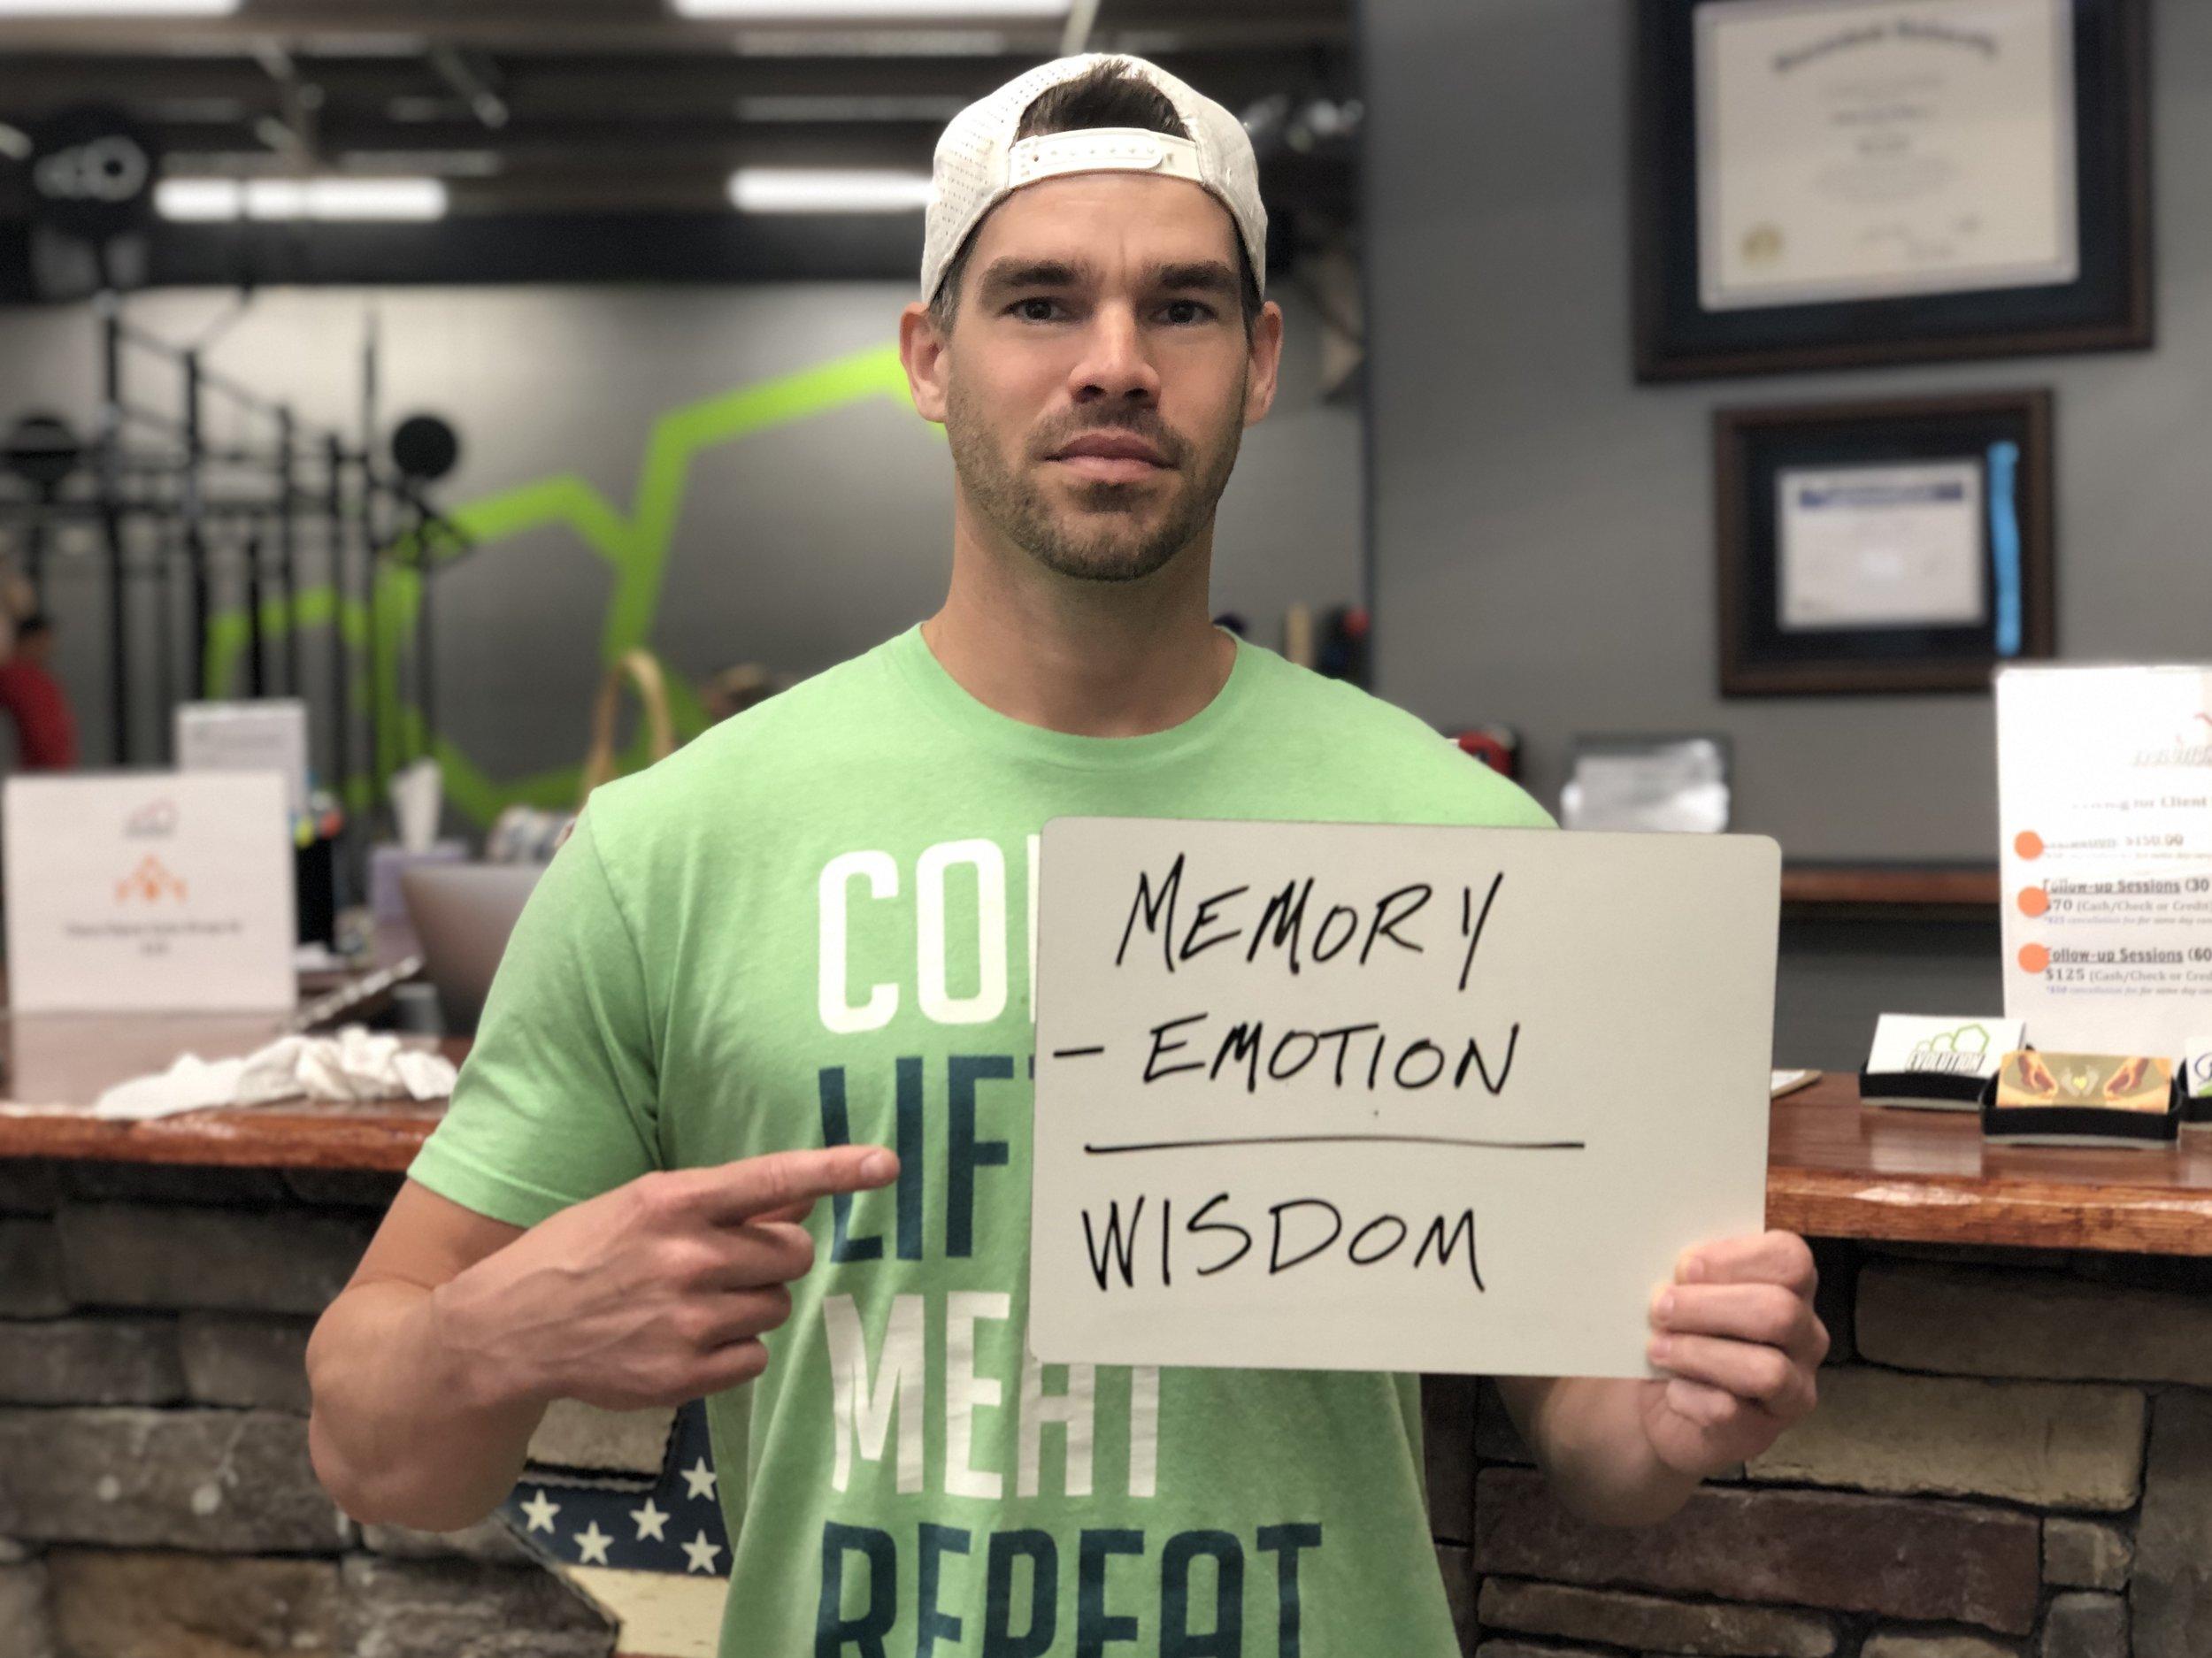 Wisdom Is Memory Minus Emotion.jpg